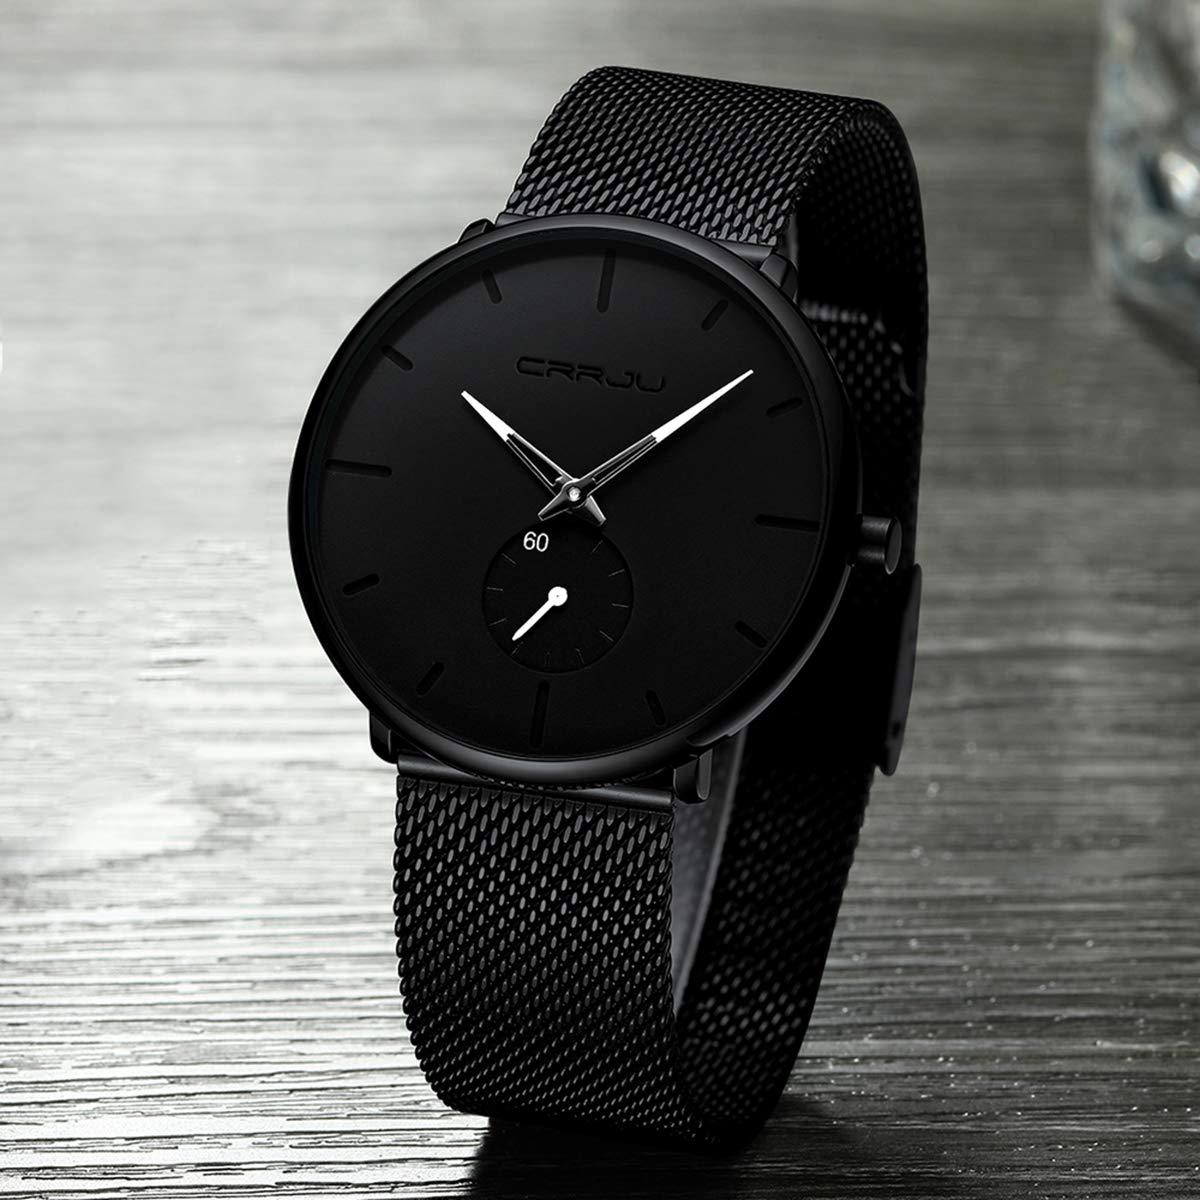 H4537ee3eccf64781b45e296bcd06154ec CRRJU Ultra Thin Blue Stainless steel Quartz Watches Men Simple Fashion Business Japan Wristwatch Clock Male Relogio Masculino